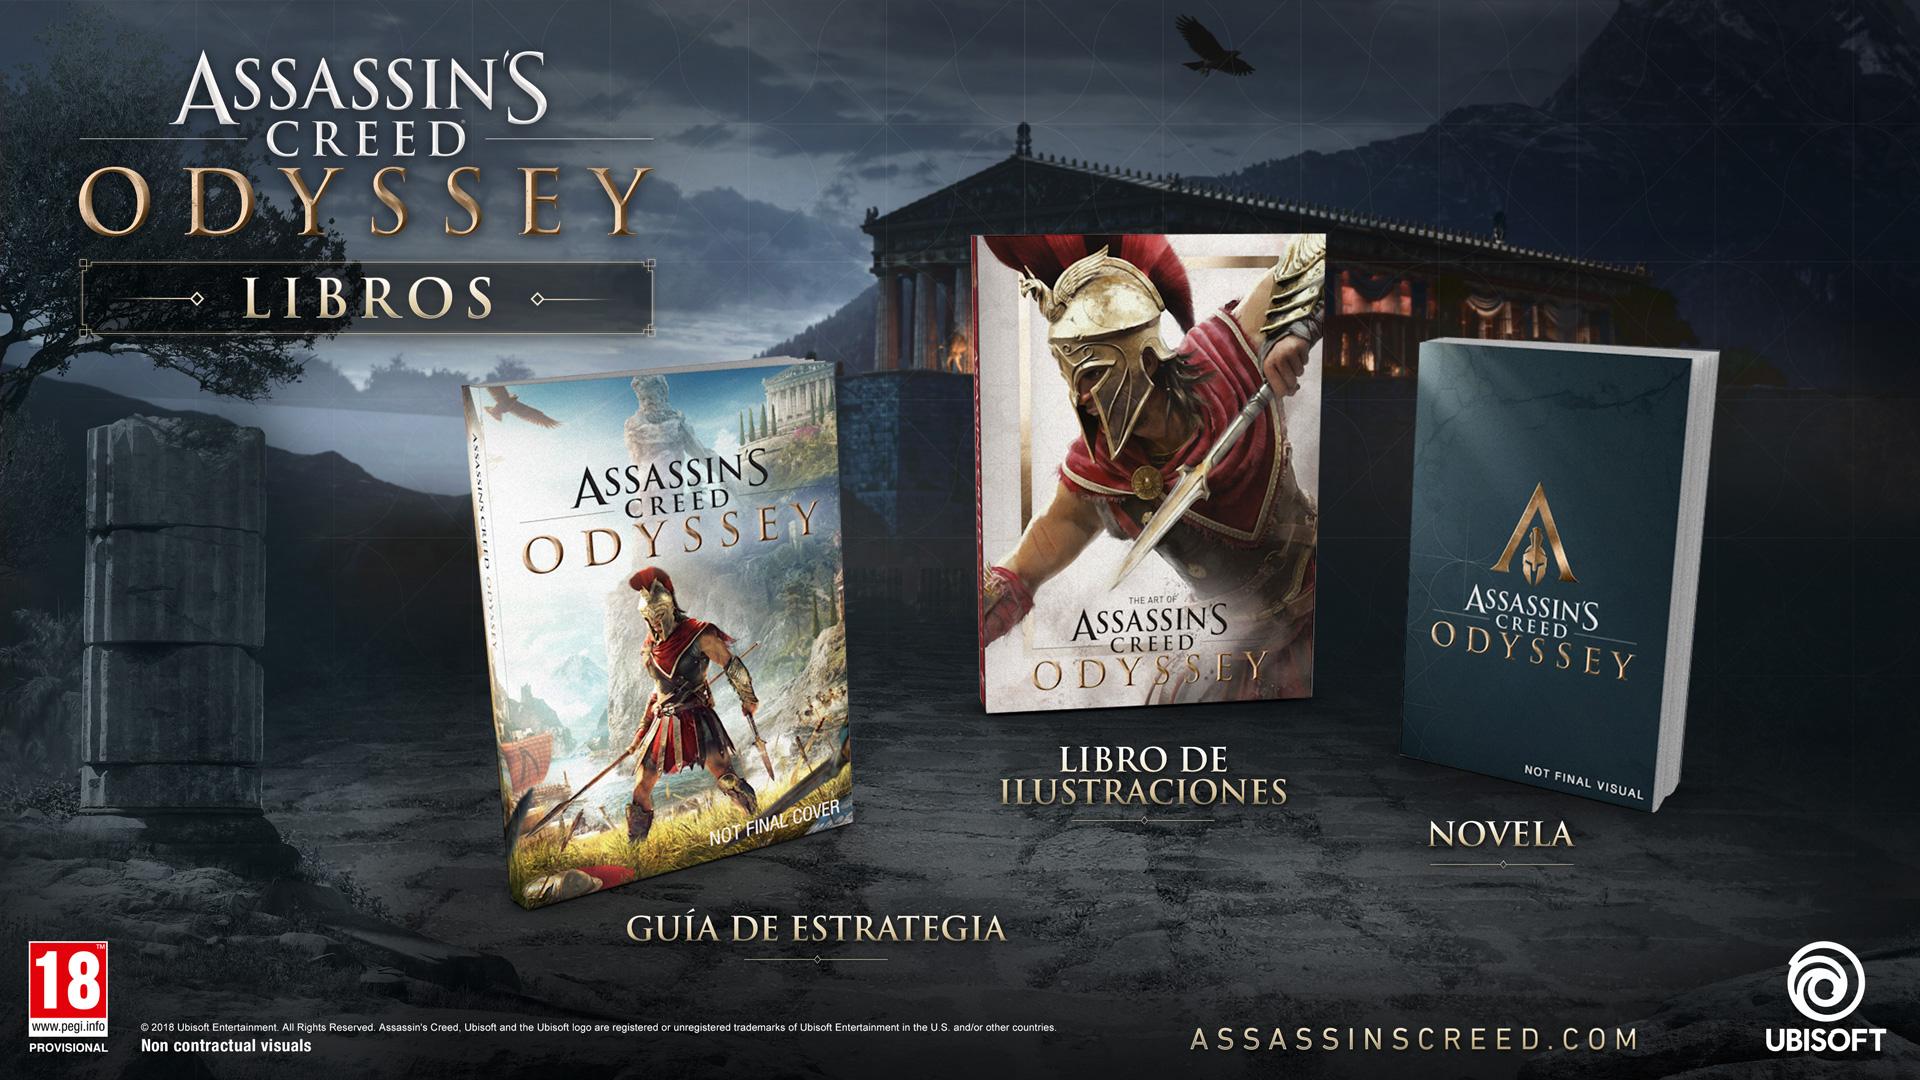 http://www.idgtv.es/archivos/201806/assassins-creed-odyssey.jpg